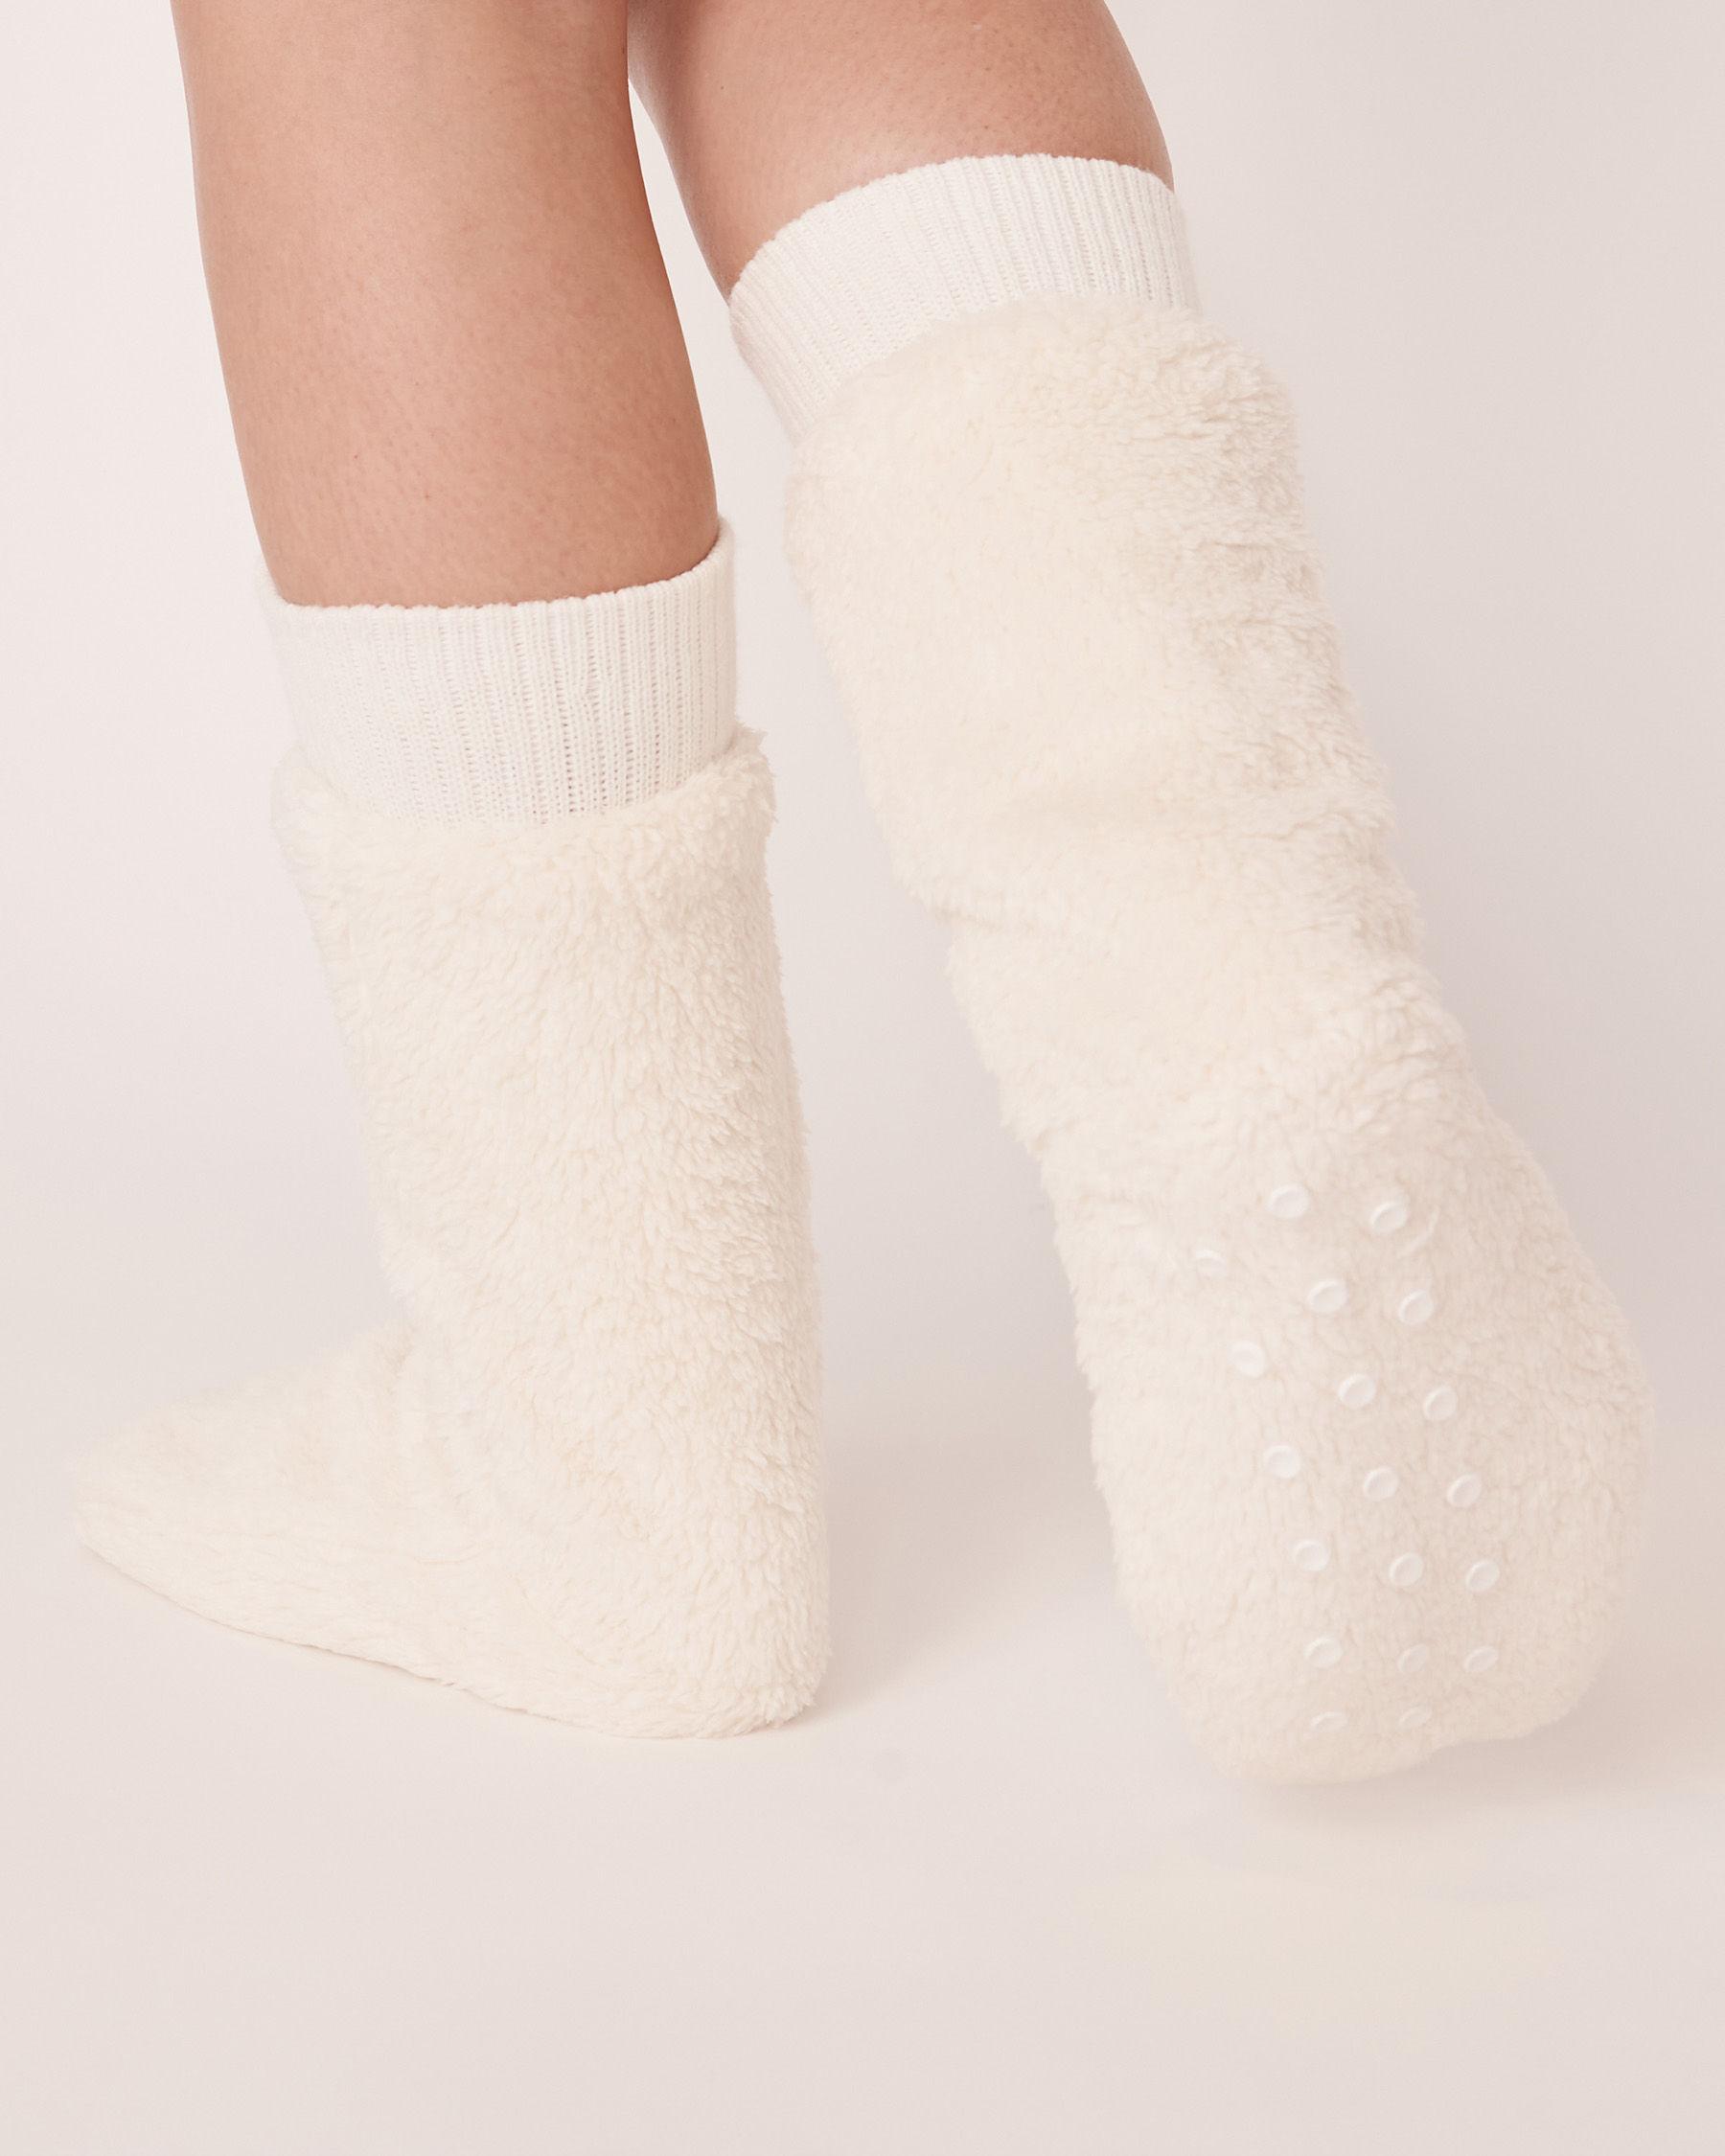 LA VIE EN ROSE Plush Mid Length Socks White 40700050 - View2